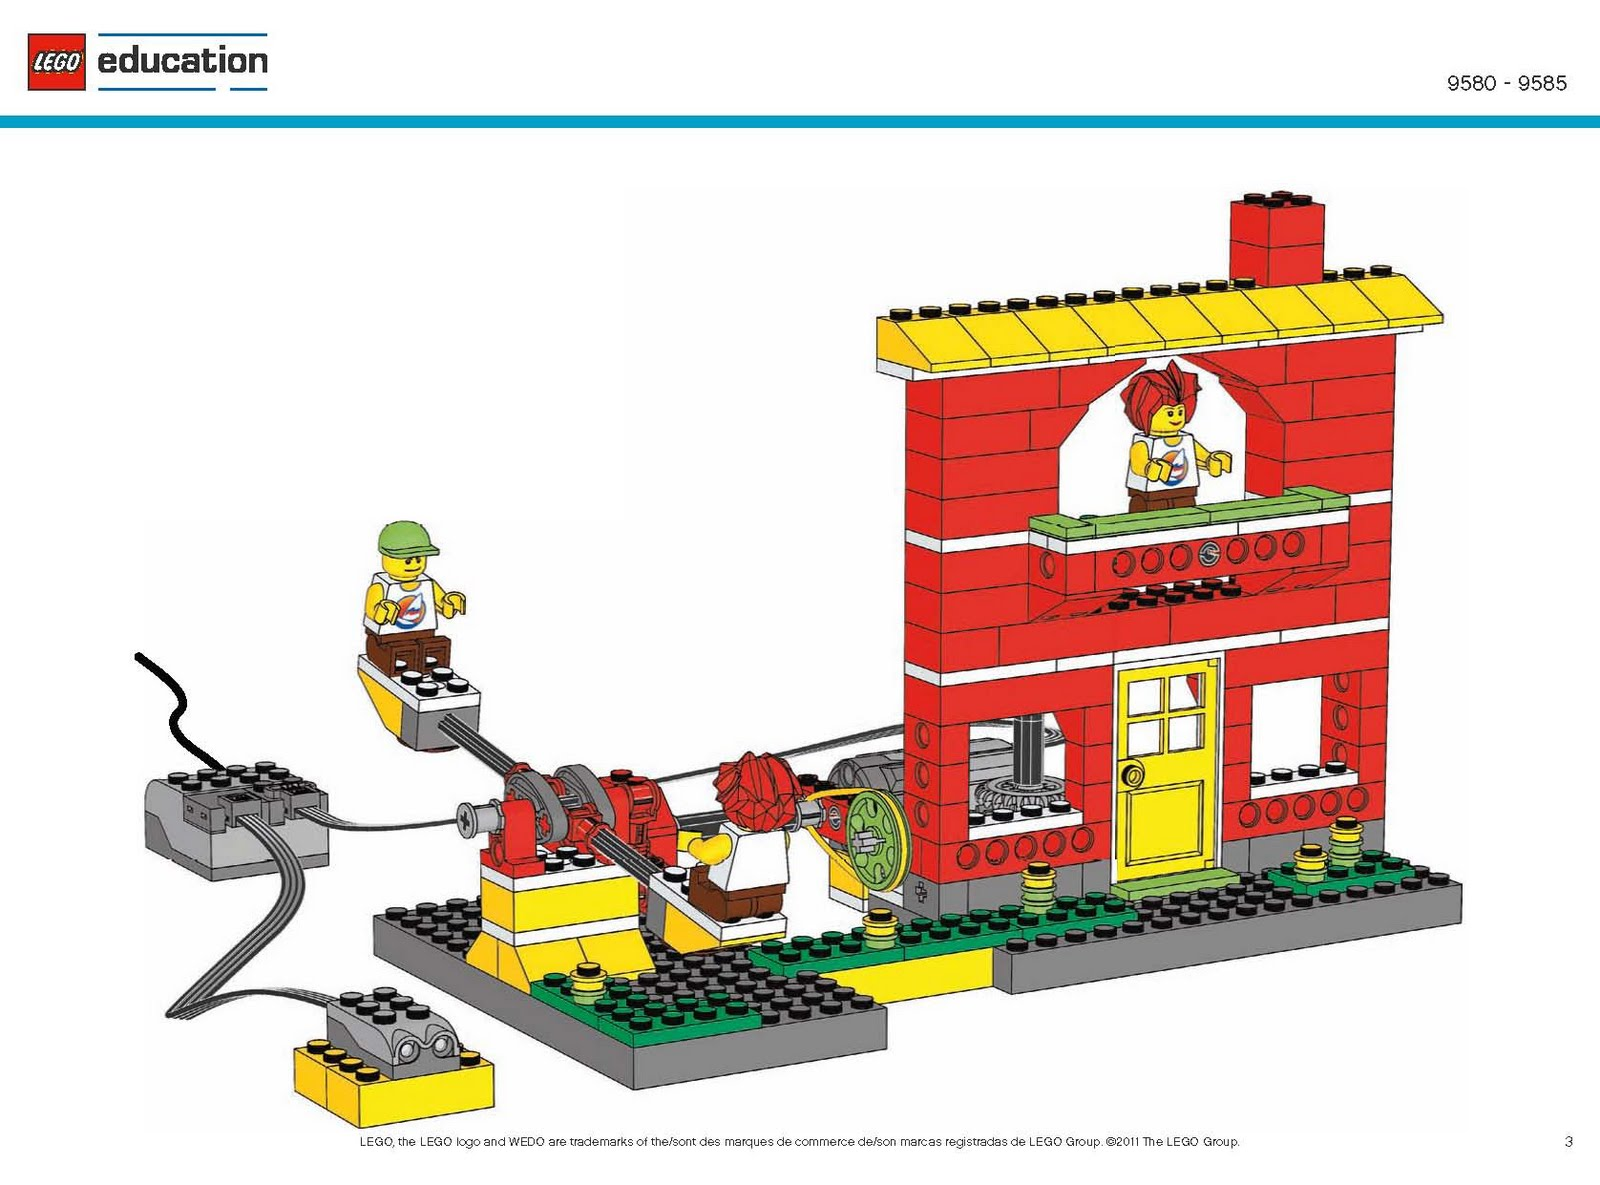 Robotics Education Centre New 9585 Lego Education Wedo Resource Set